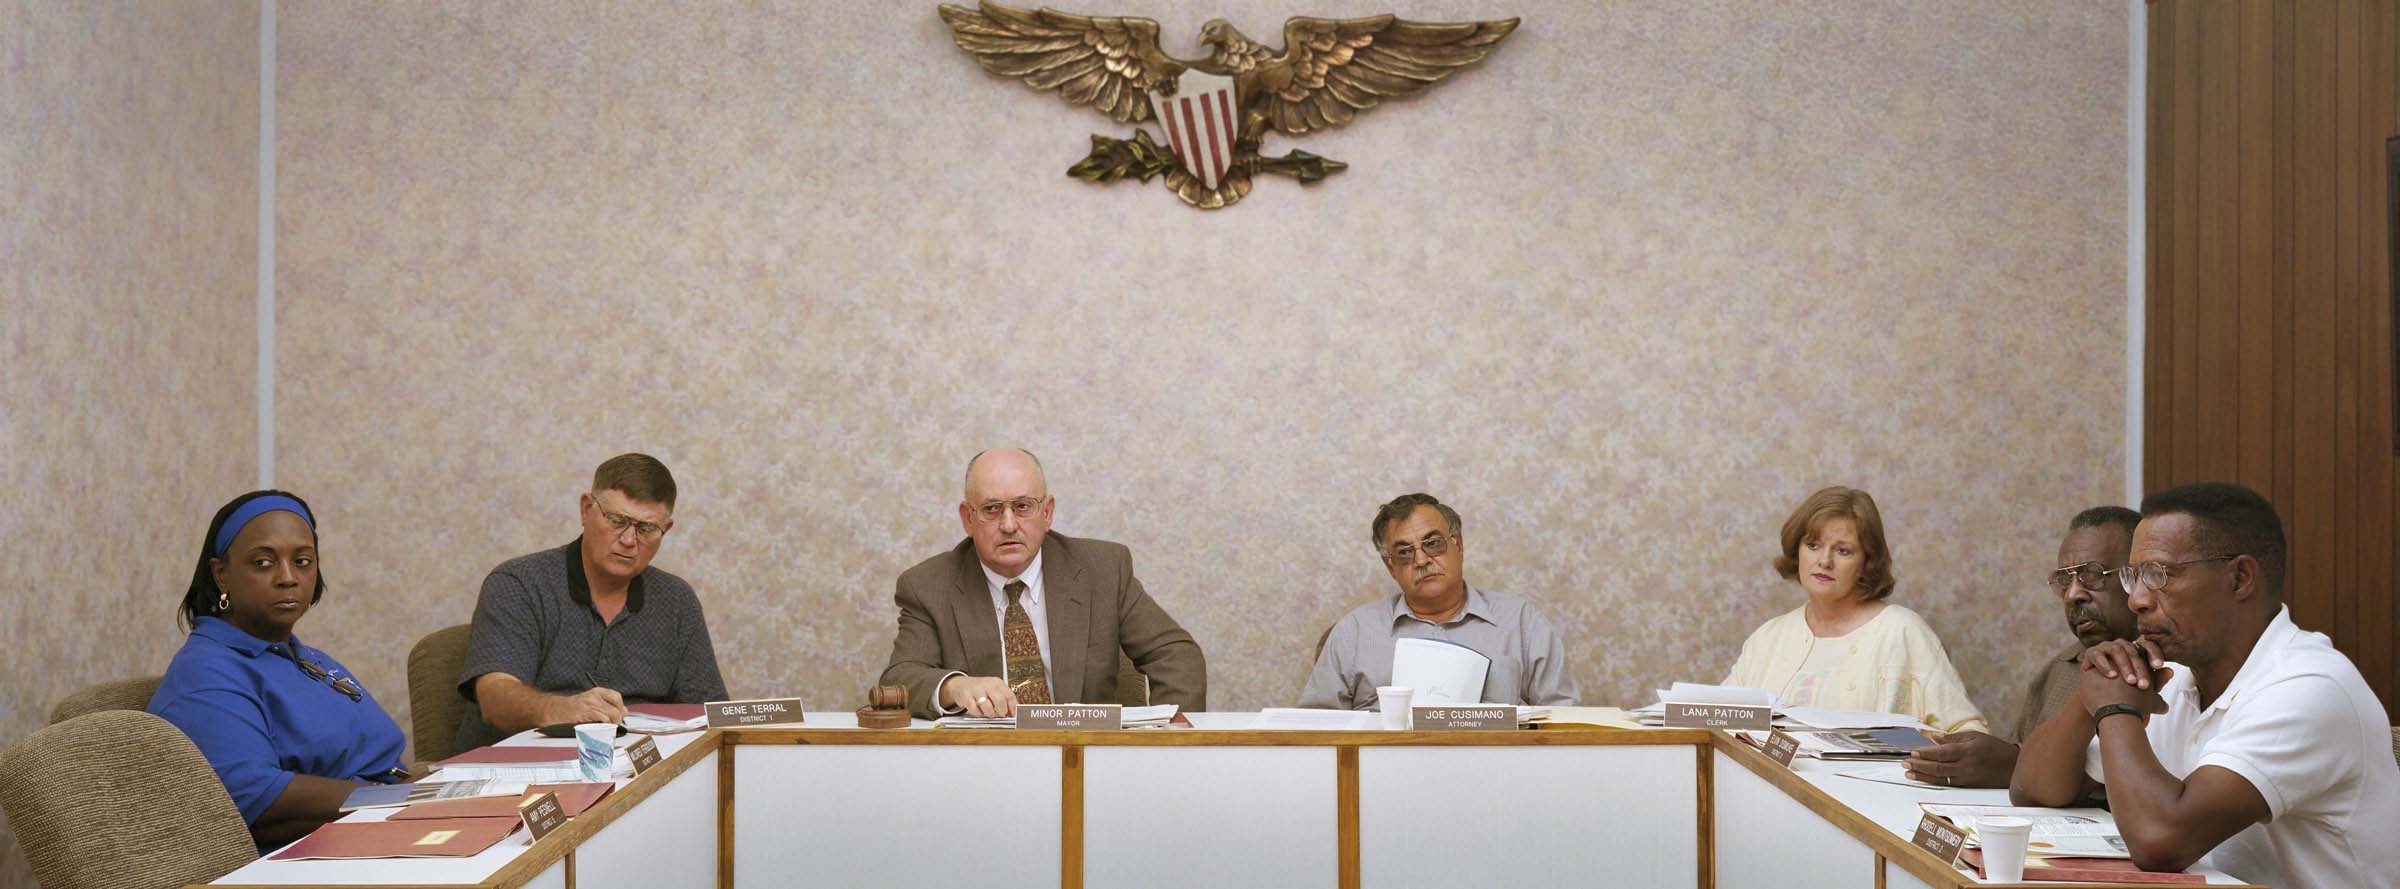 Bernice, Louisiana (population 1,809) Town Council, May 14, 2002.